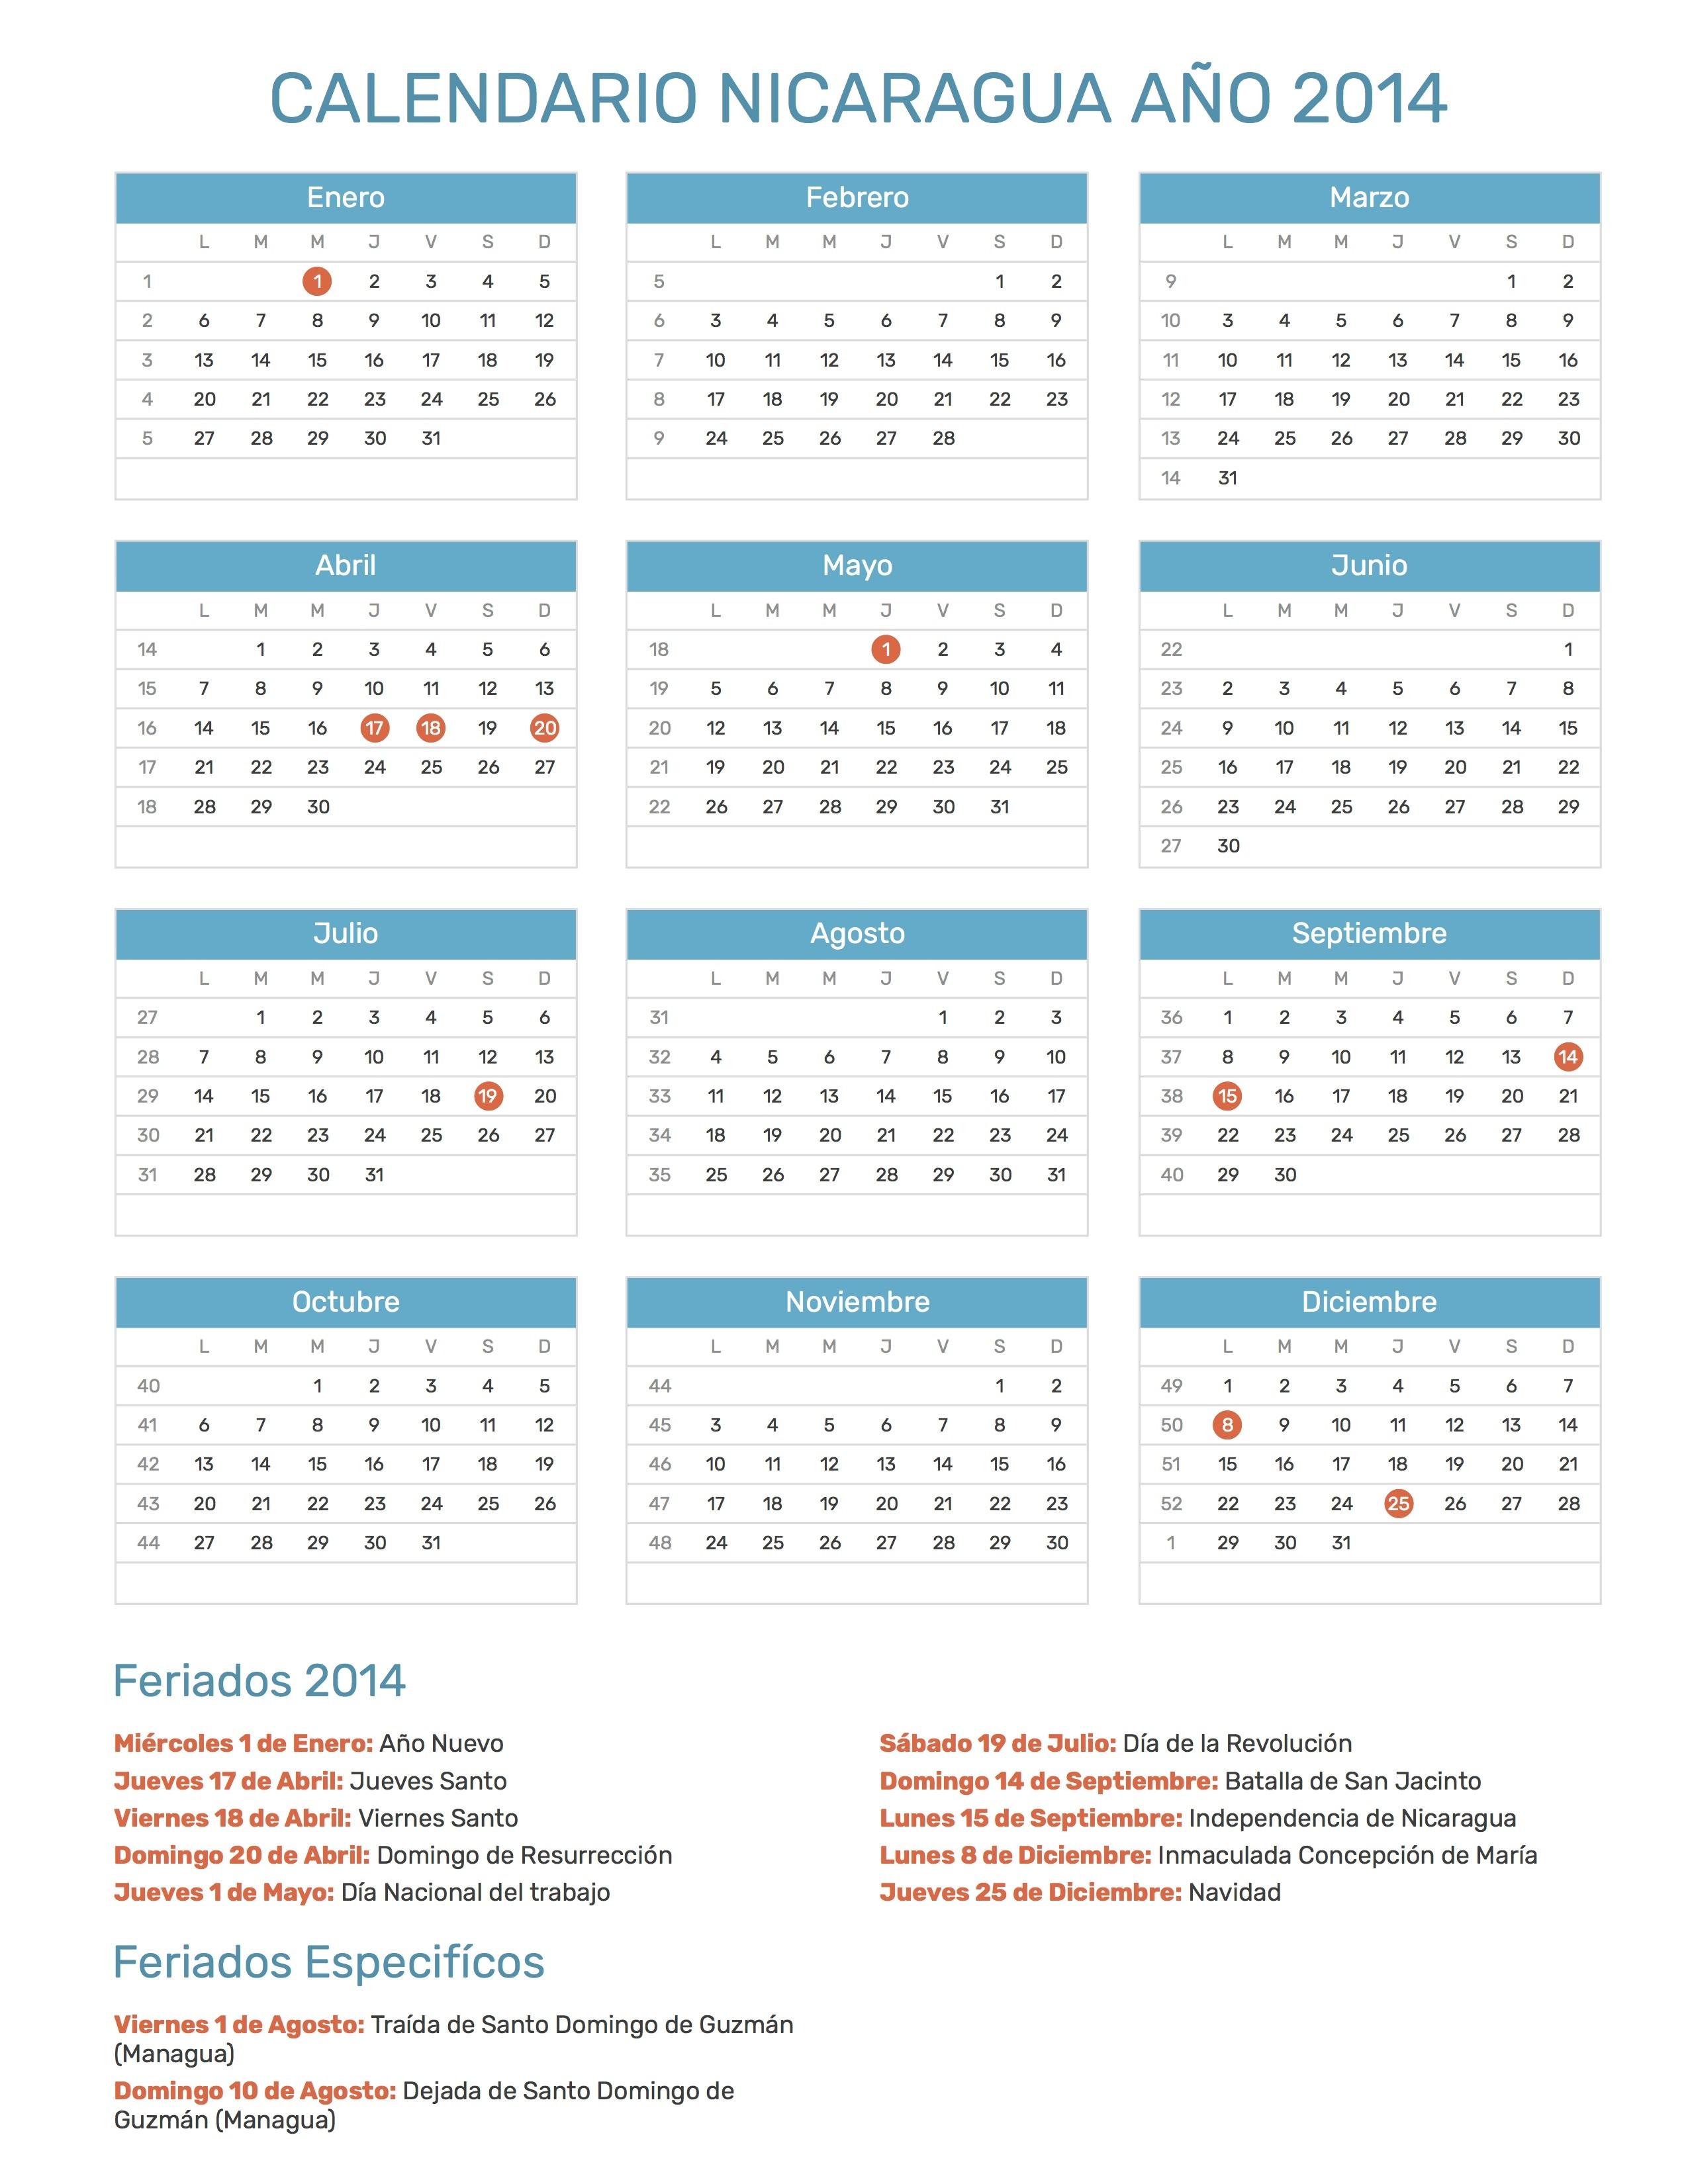 2014 calendario primero mondays espa±ol Negrita